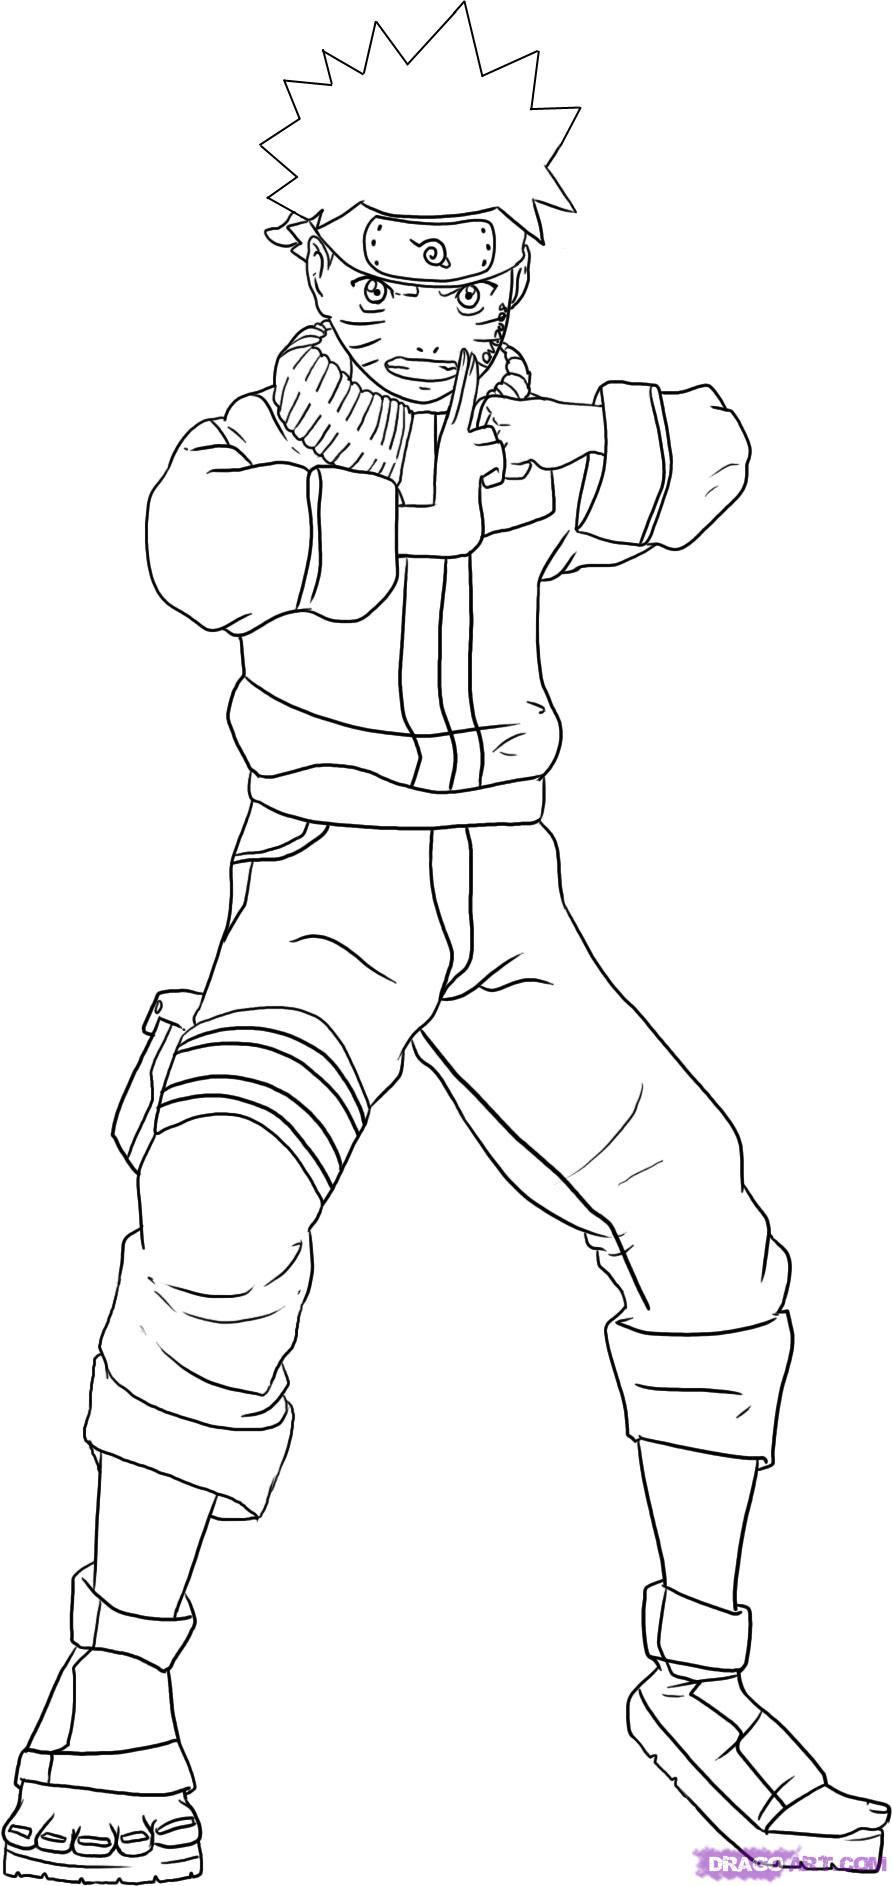 Draw Naruto Full Body Clip Art Library